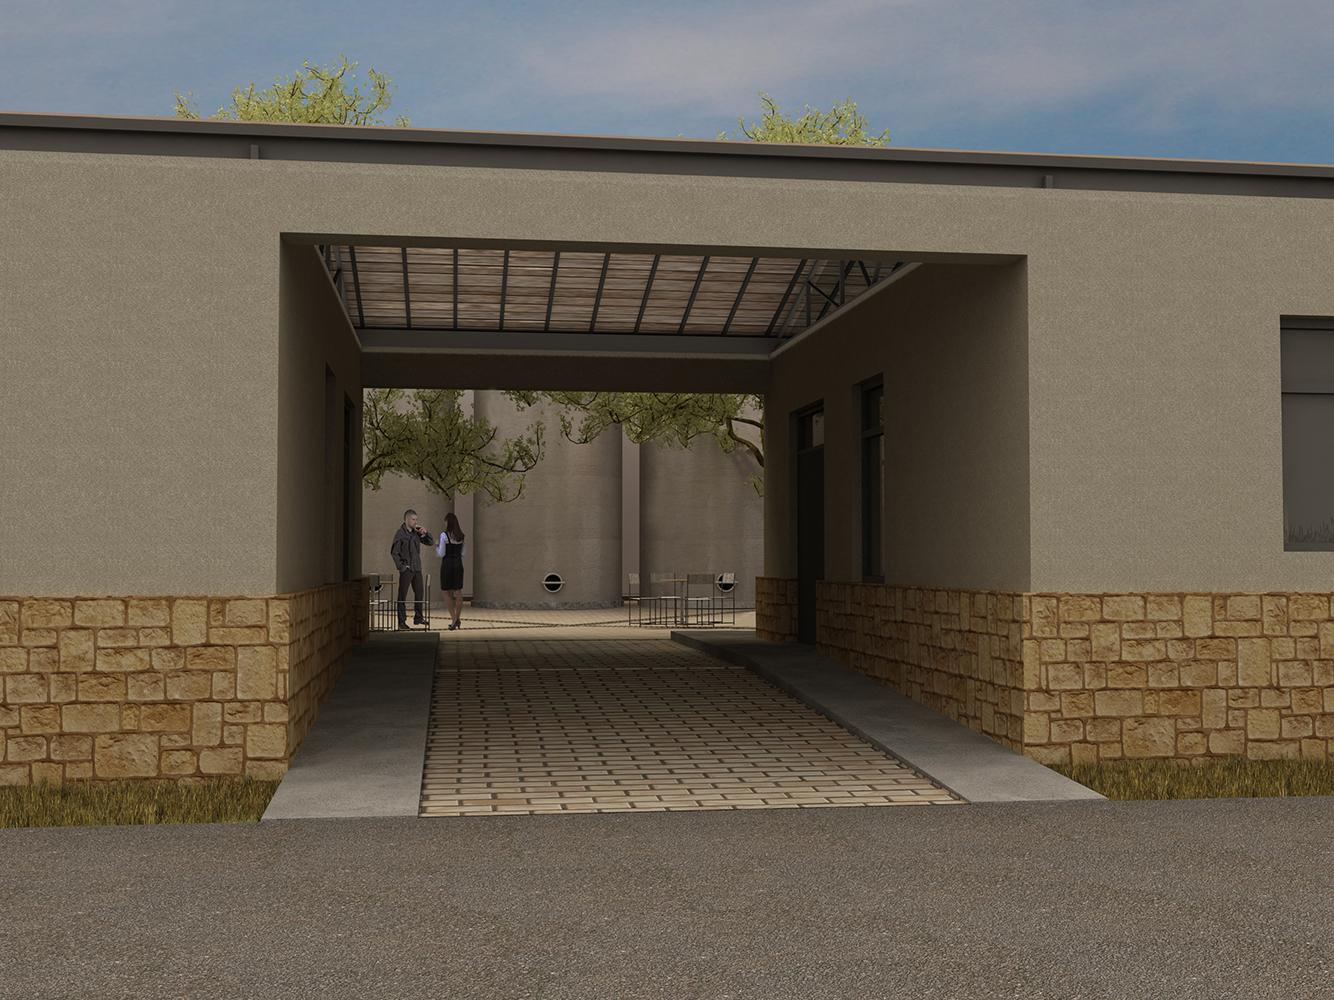 Kechris winery's entrance